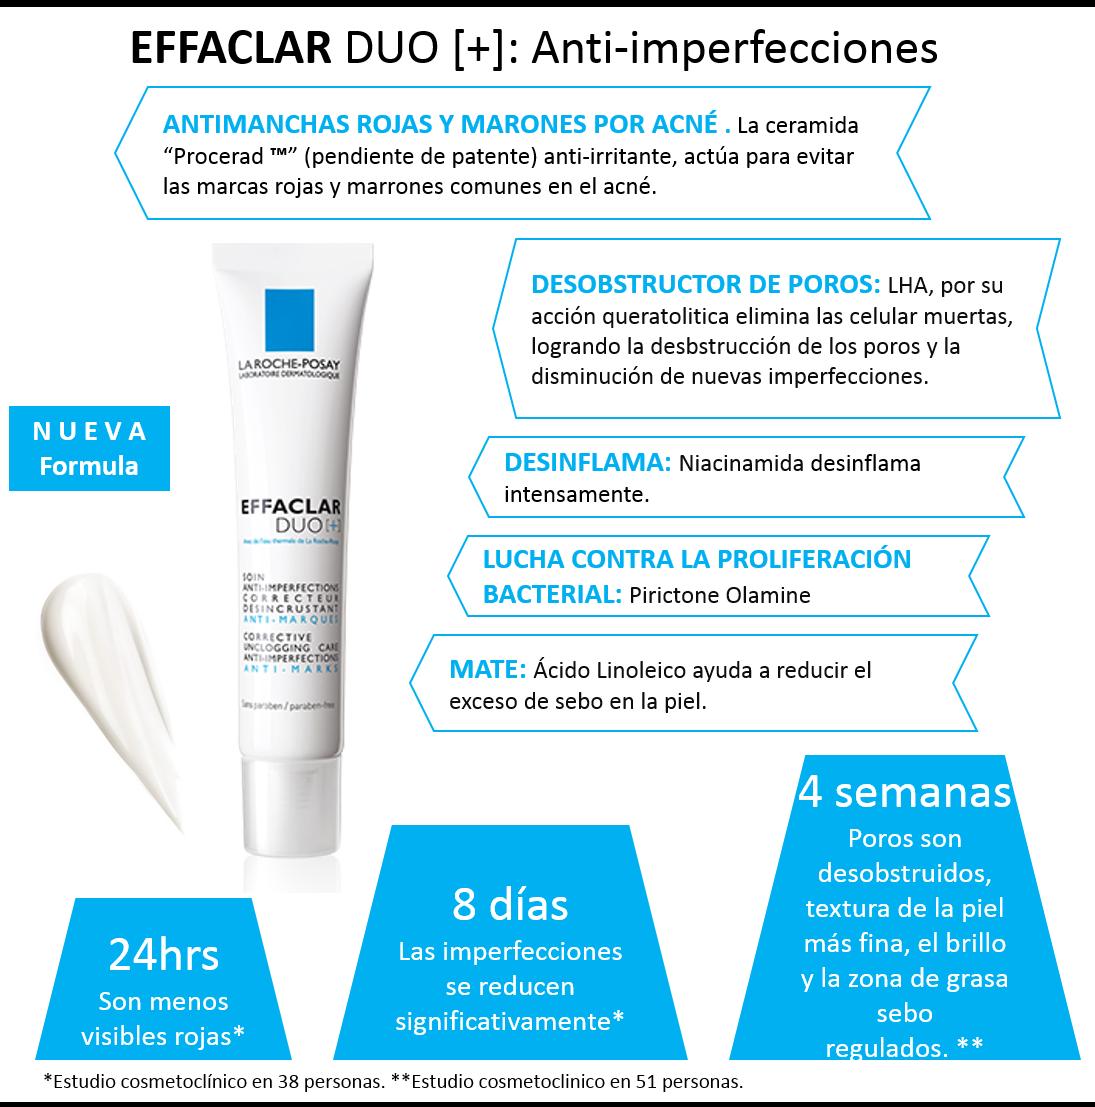 EFFACLAR Duo PLUS Effaclar Duo Plus Duo PLUS Effaclar Duo PlusEffaclar Duo Plus